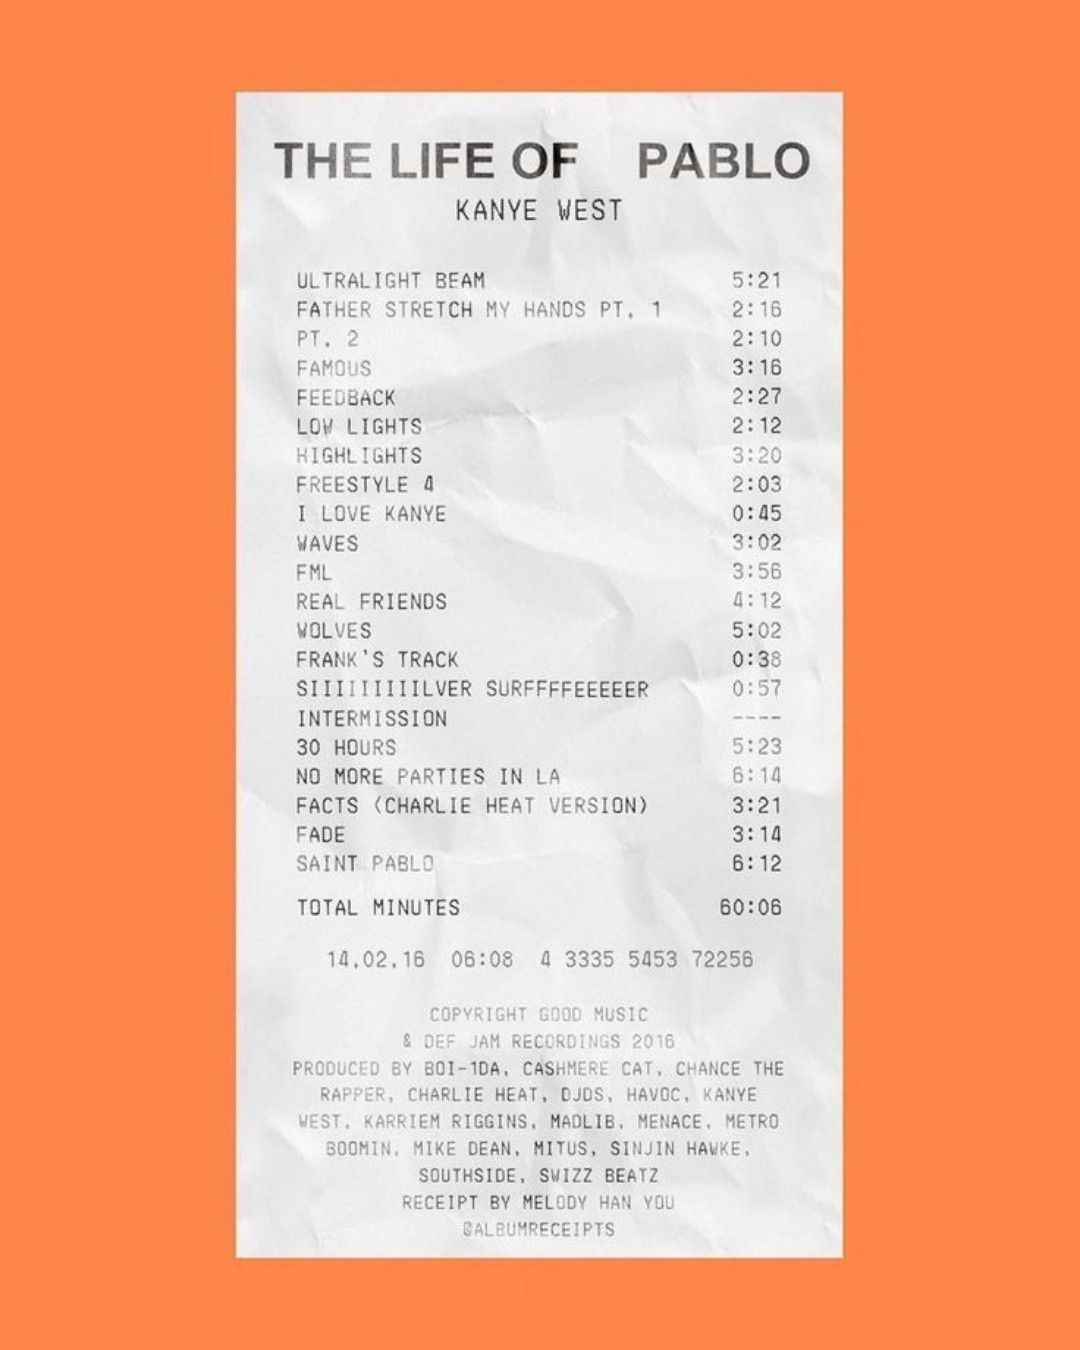 Kanye West Album Receipt In 2020 Music Poster Ideas Music Poster Design Kanye West Albums